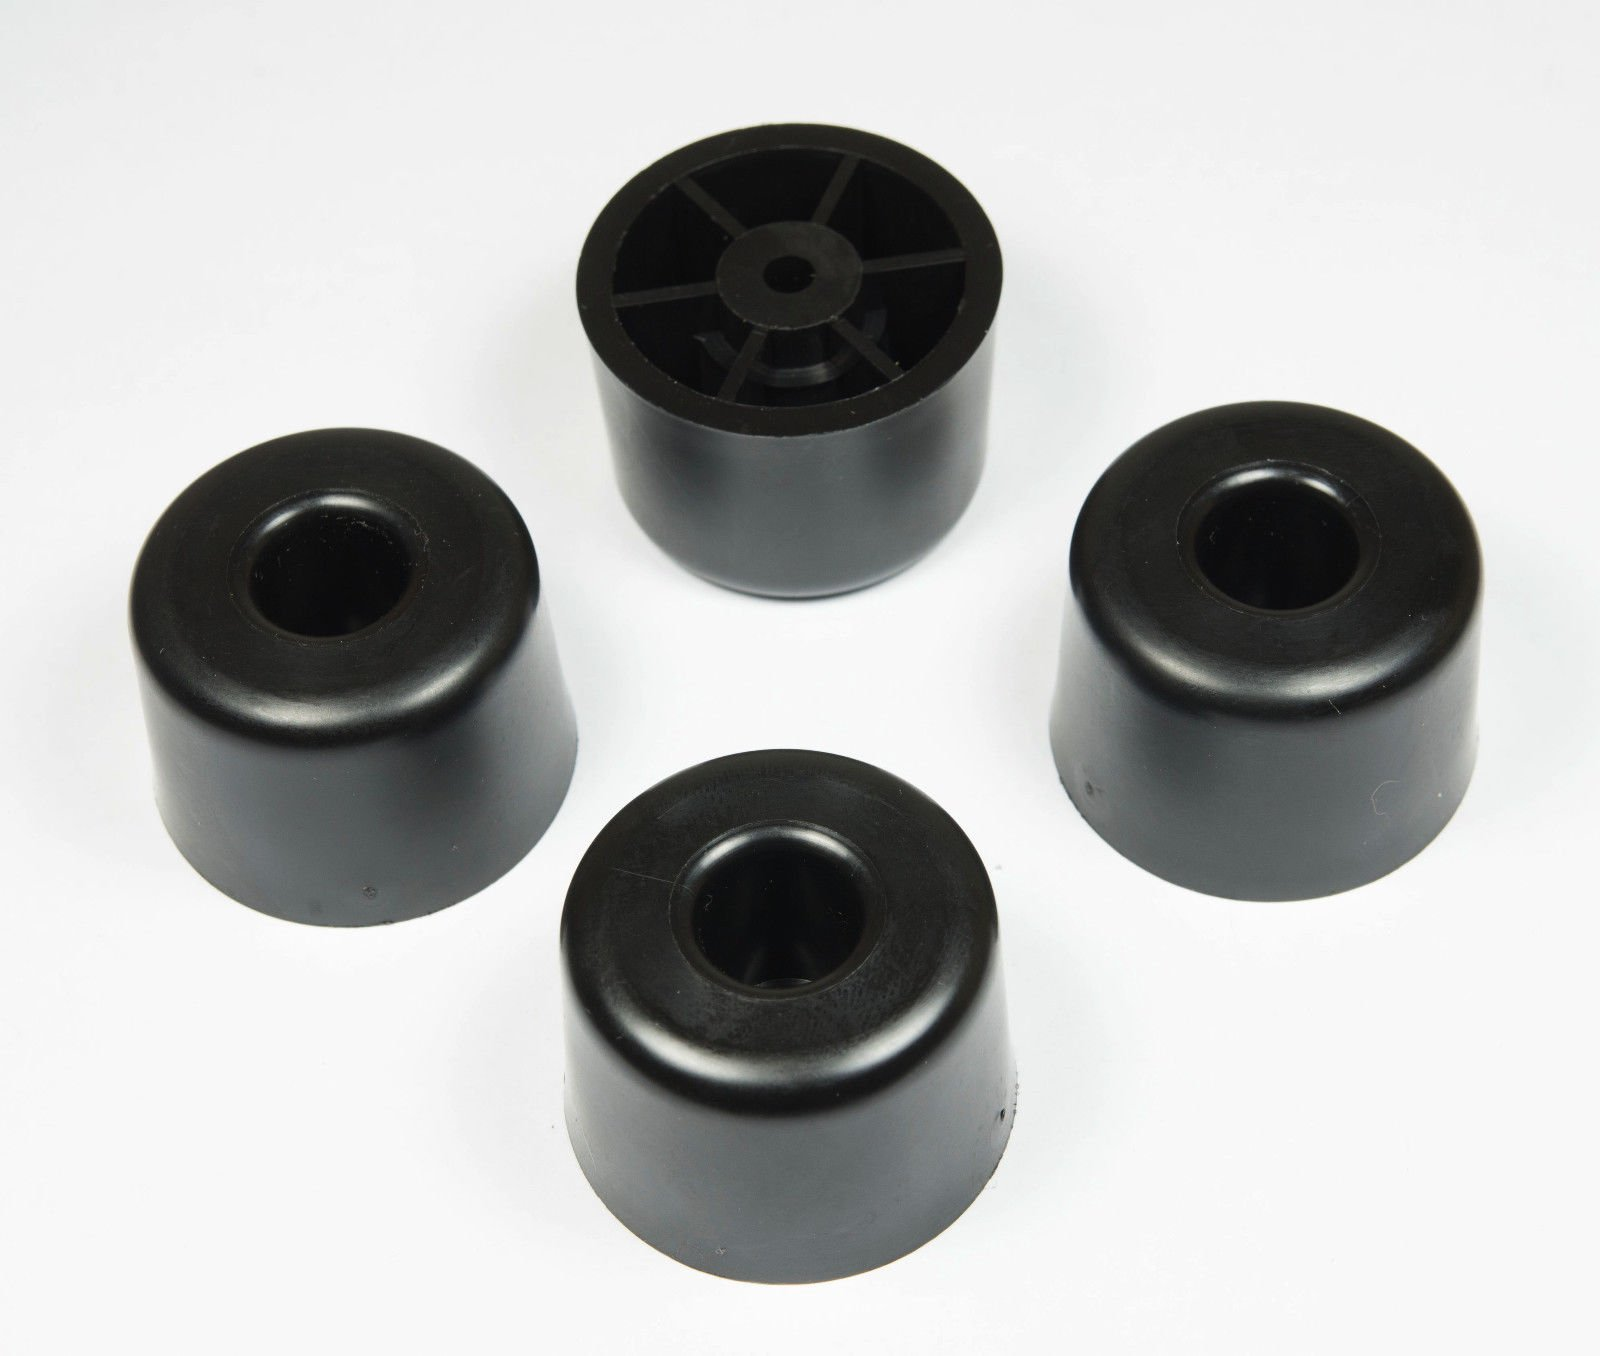 4 Large Medium Round Rubber FEET - .1.135 H X 1.621 D